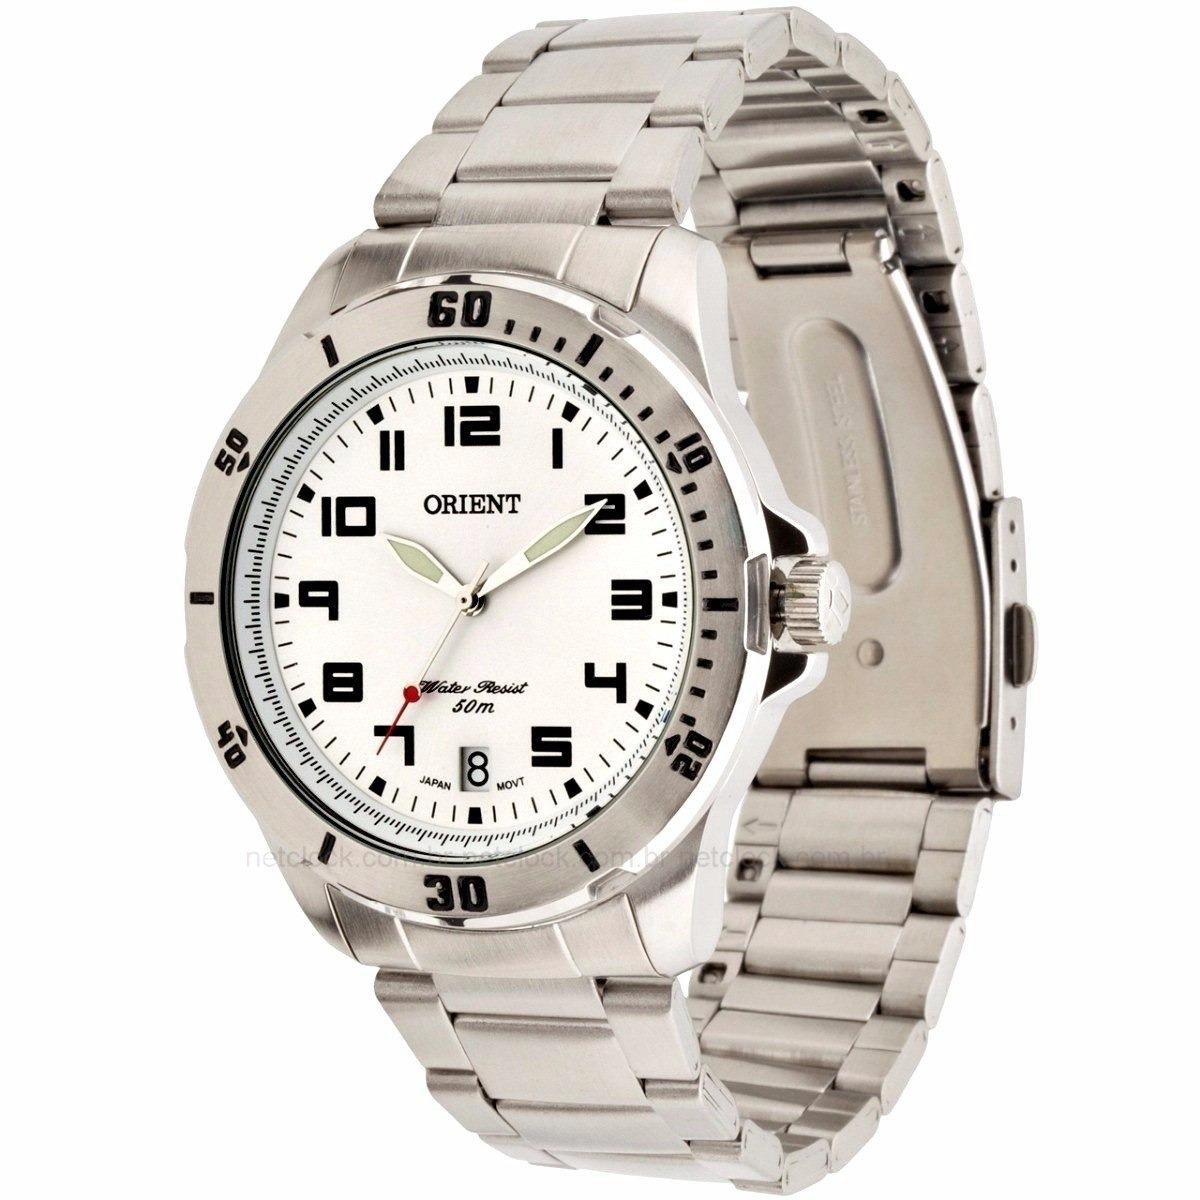 9655646e84b relógio orient masculino 1 ano garantia mbss1155a s2sx. Carregando zoom.